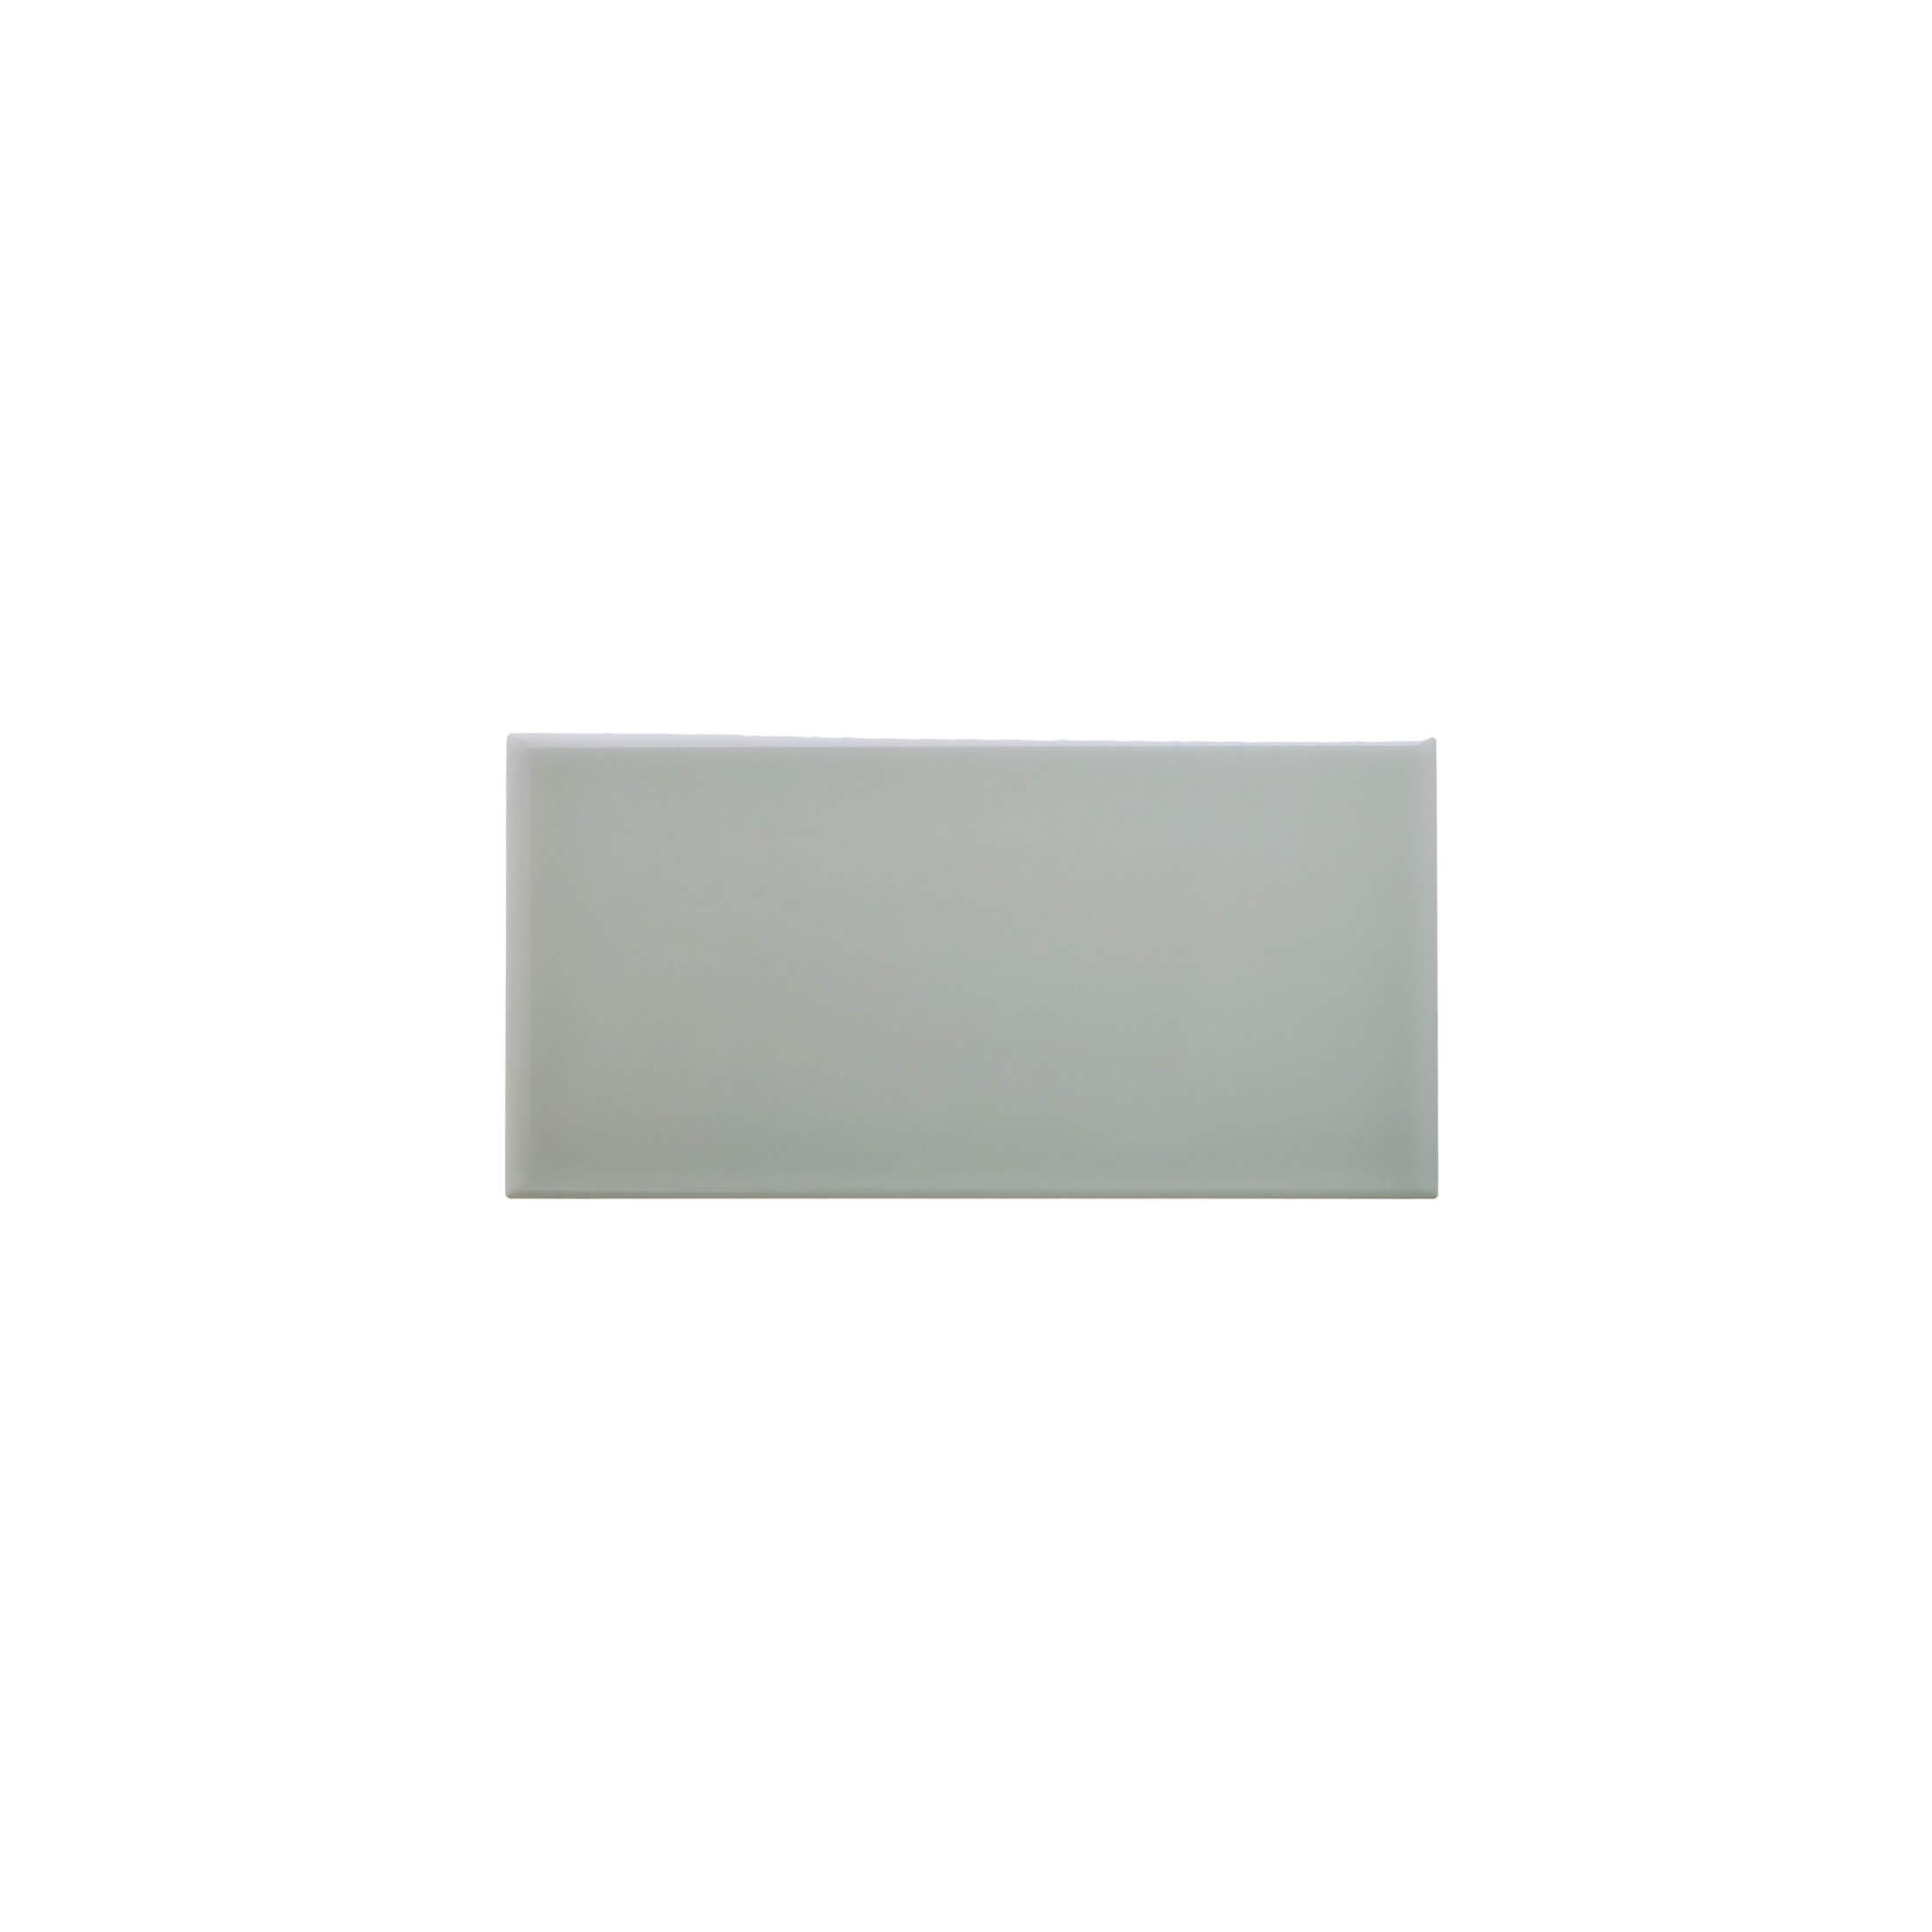 ADNE1092 - LISO PB - 7.5 cm X 15 cm